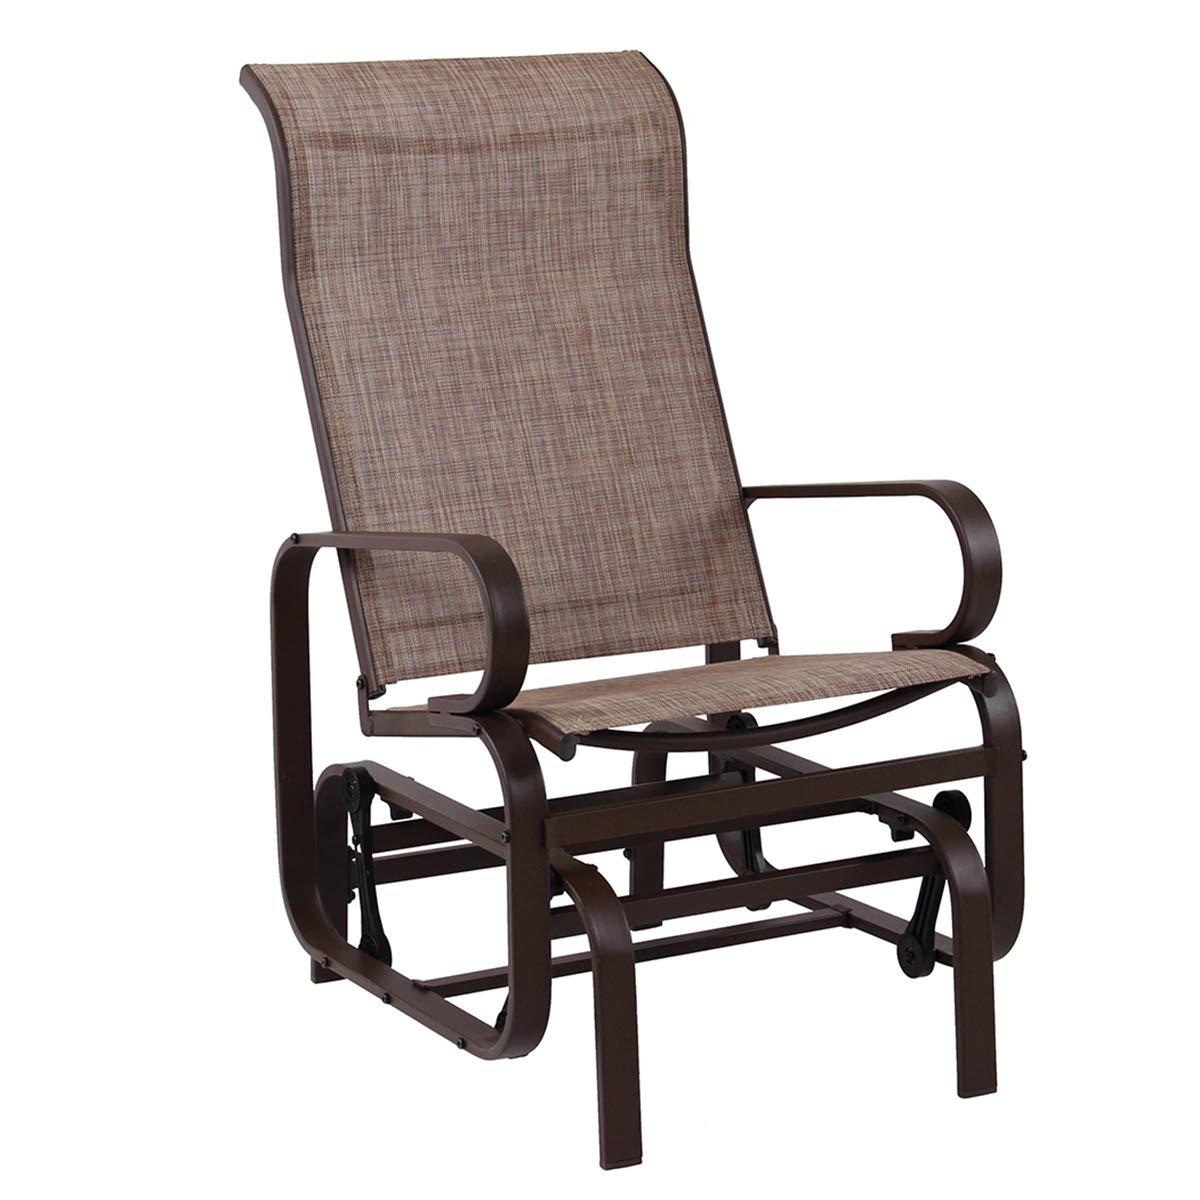 PHI VILLA Swing Glider Chair Patio Rocking Chair Garden Furniture, Textilene Mesh Steel Frame, Single Glider by PHI VILLA